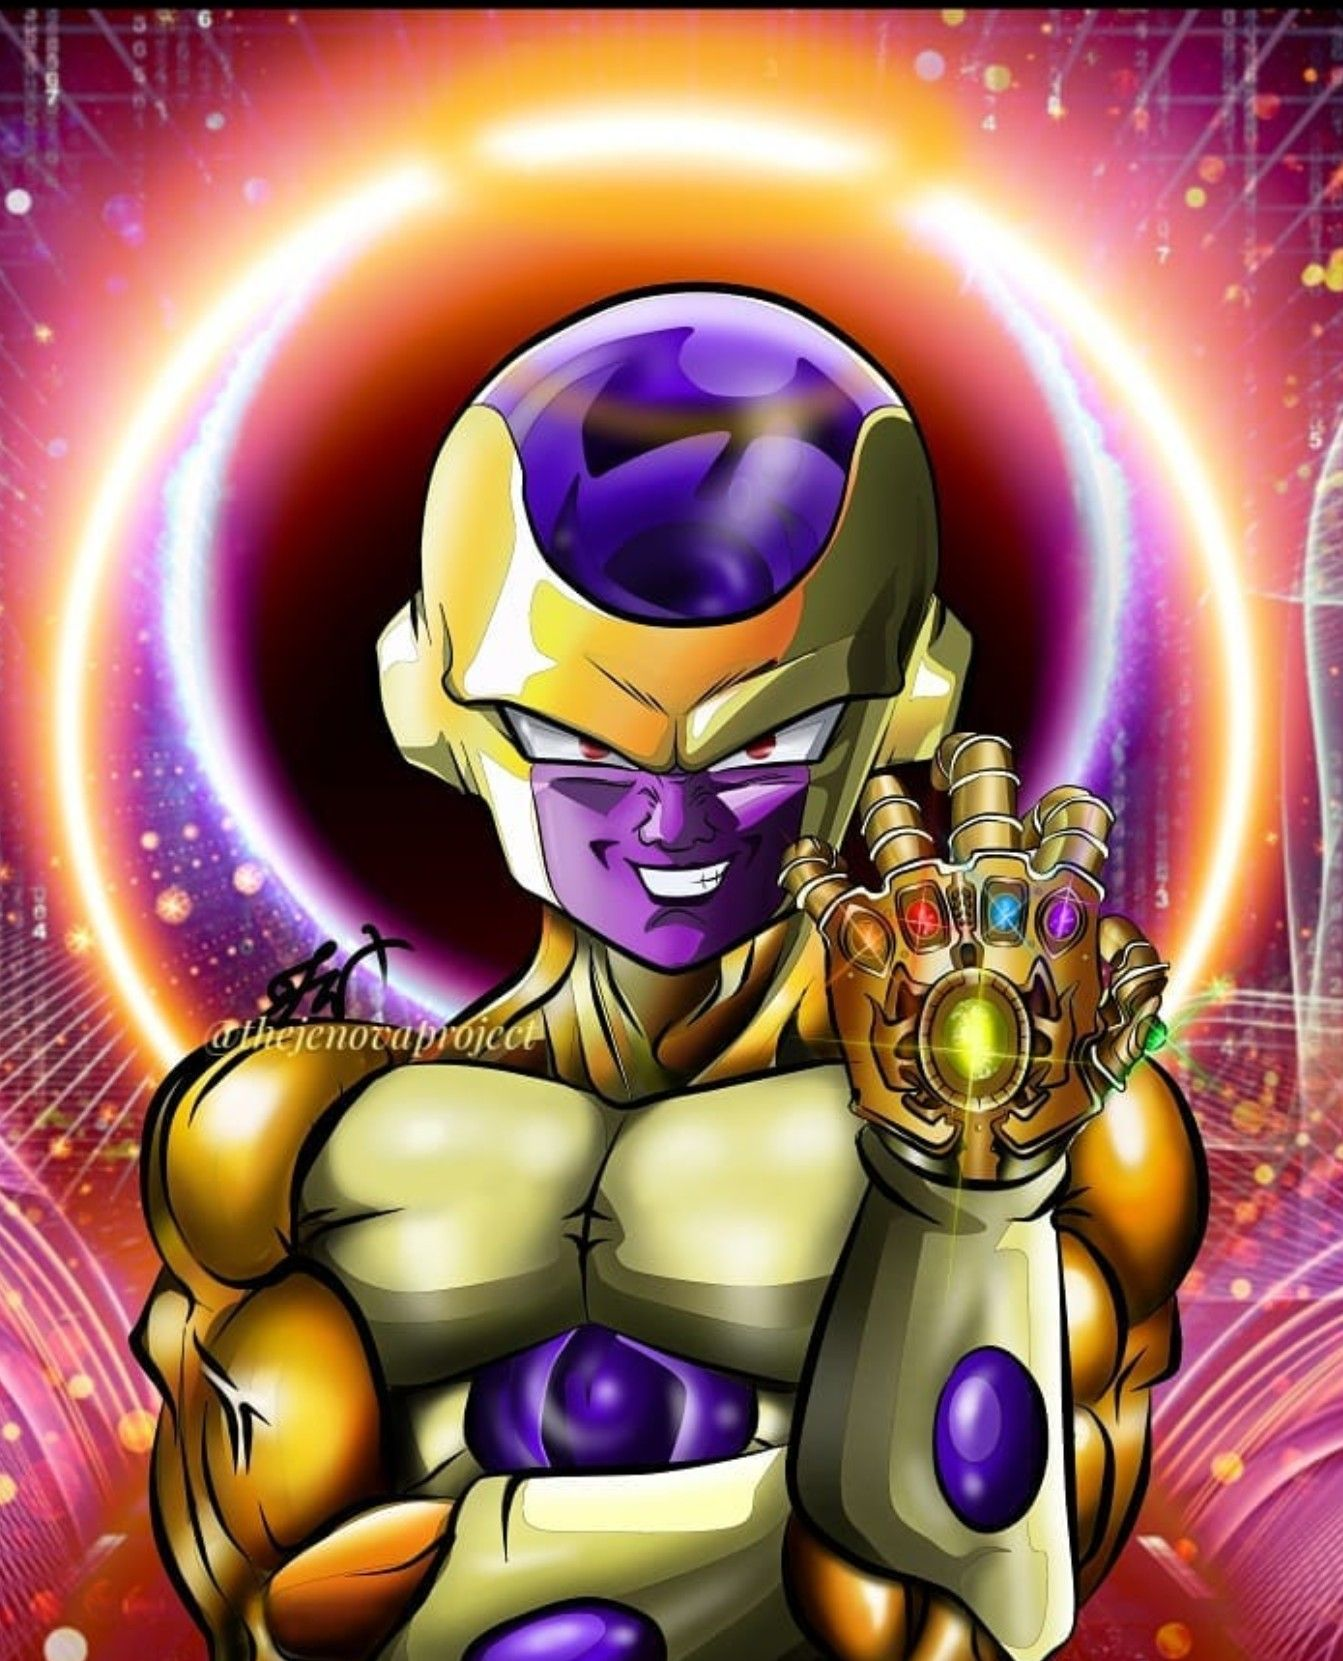 Frieza Infinity War, Dragon Ball Super (con imágenes